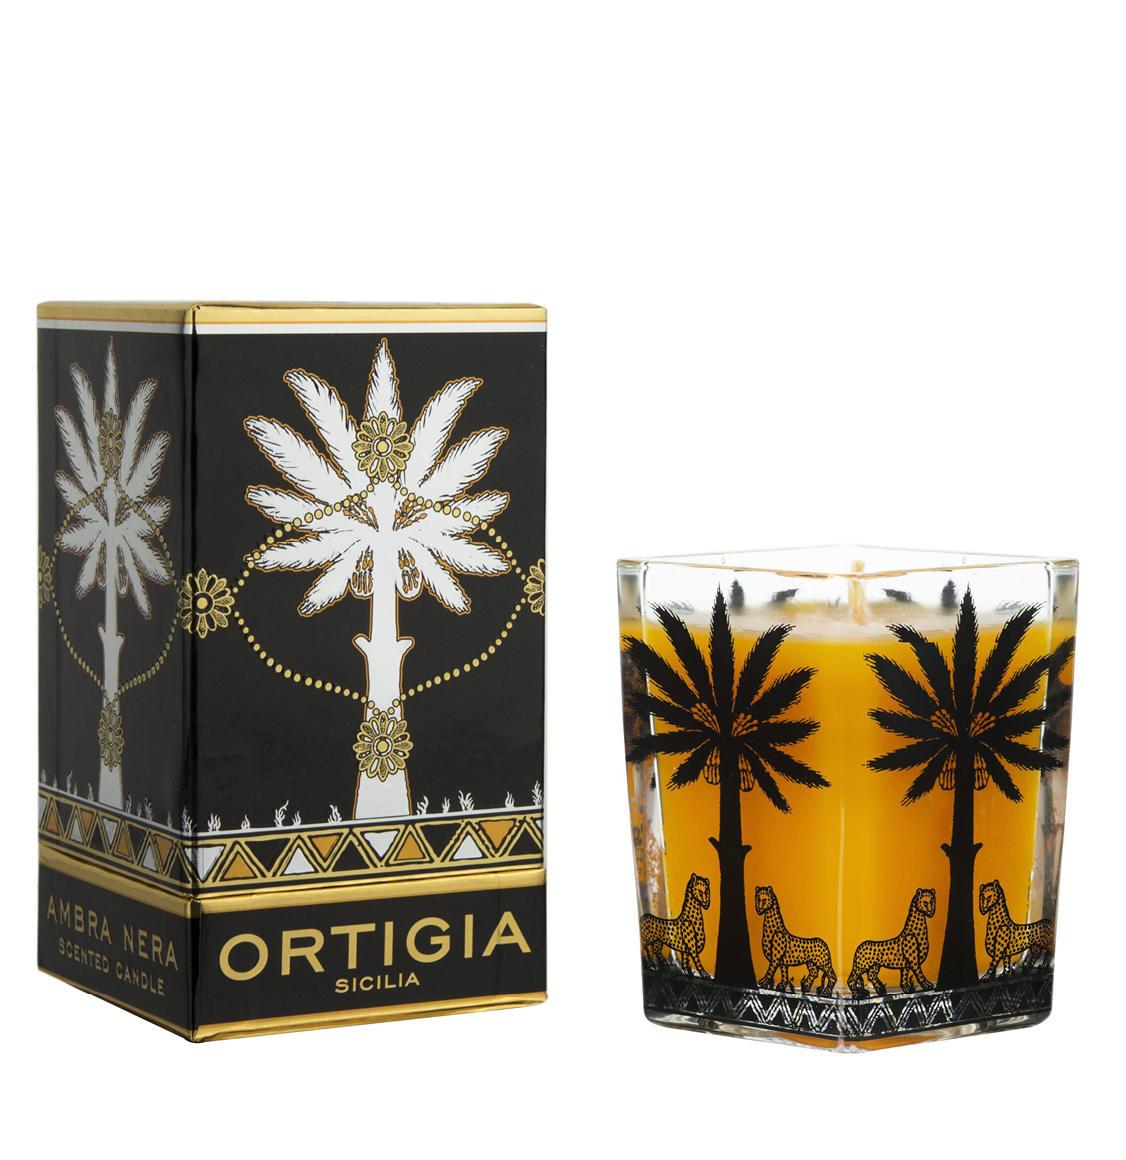 Ortigia_Sicilia_Ambra_Nera_Large_Square_Candle_The_Project_Garments_A